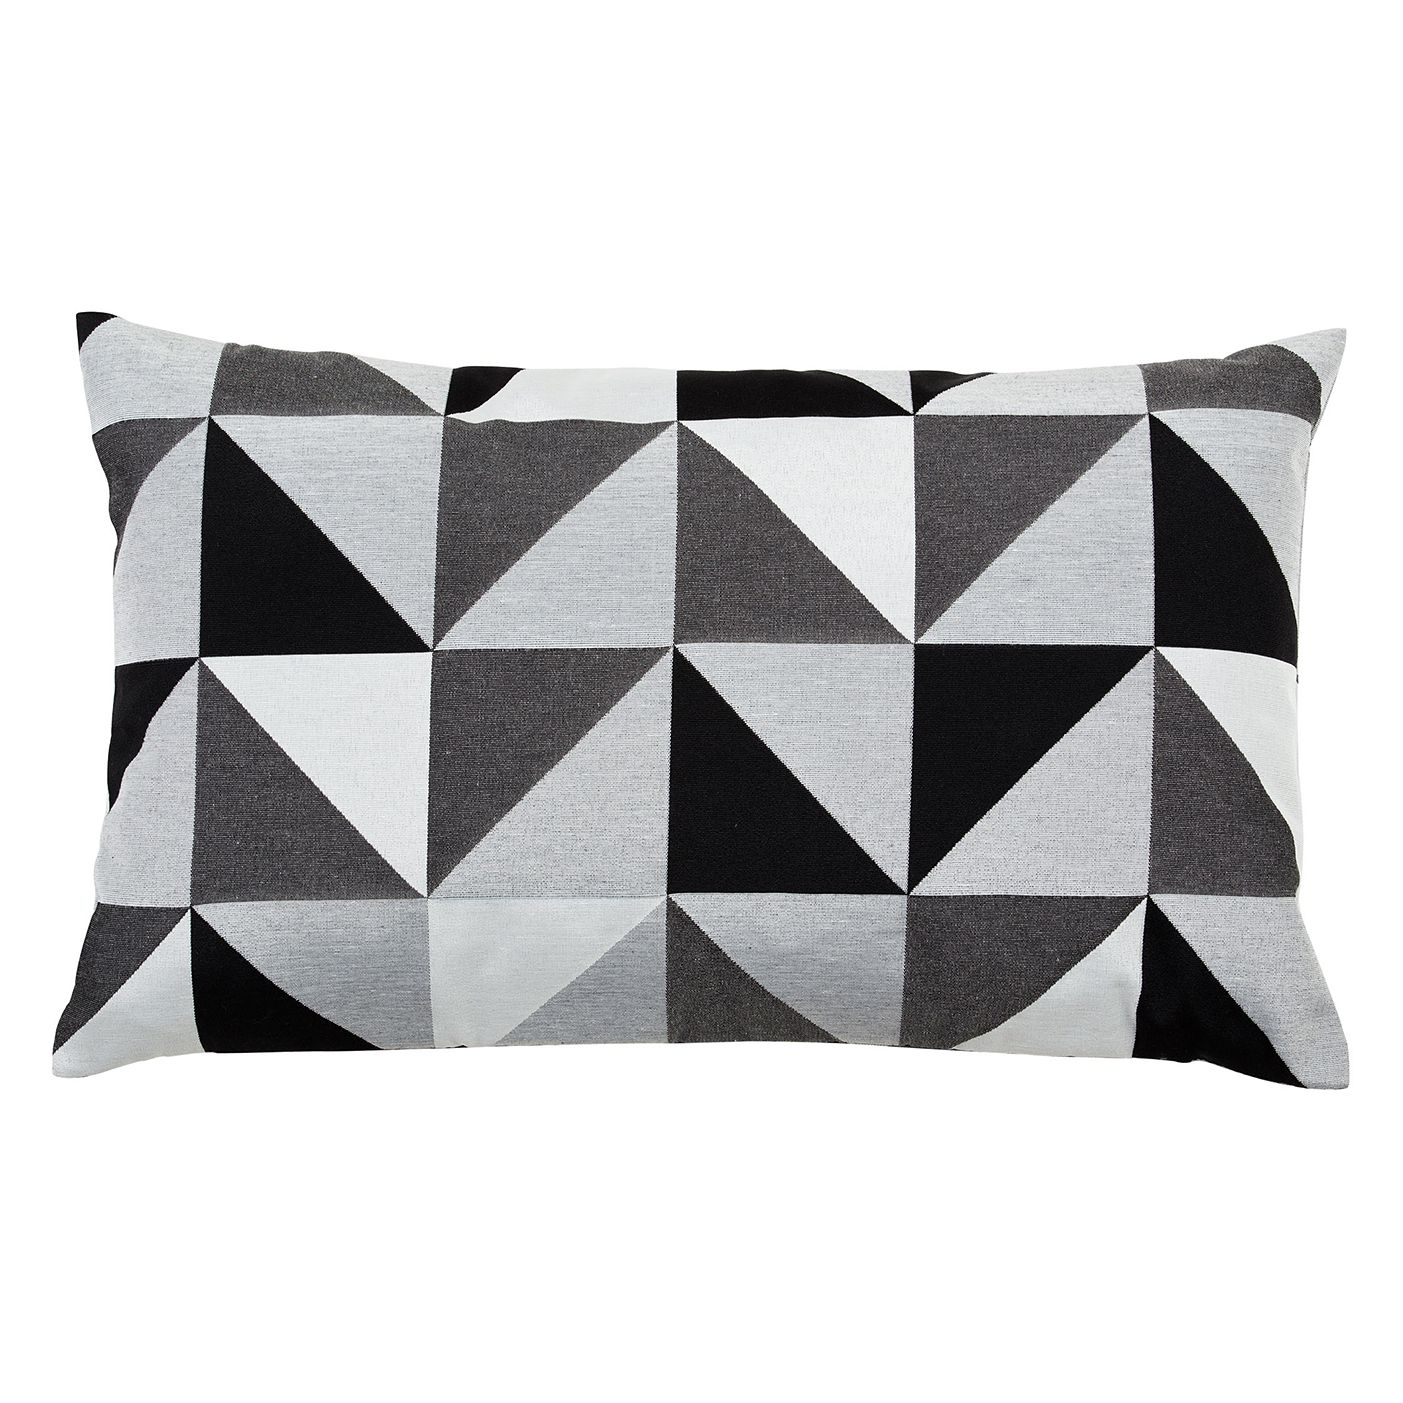 kissen geometric mischgewebe schwarz wei 30 x 50. Black Bedroom Furniture Sets. Home Design Ideas